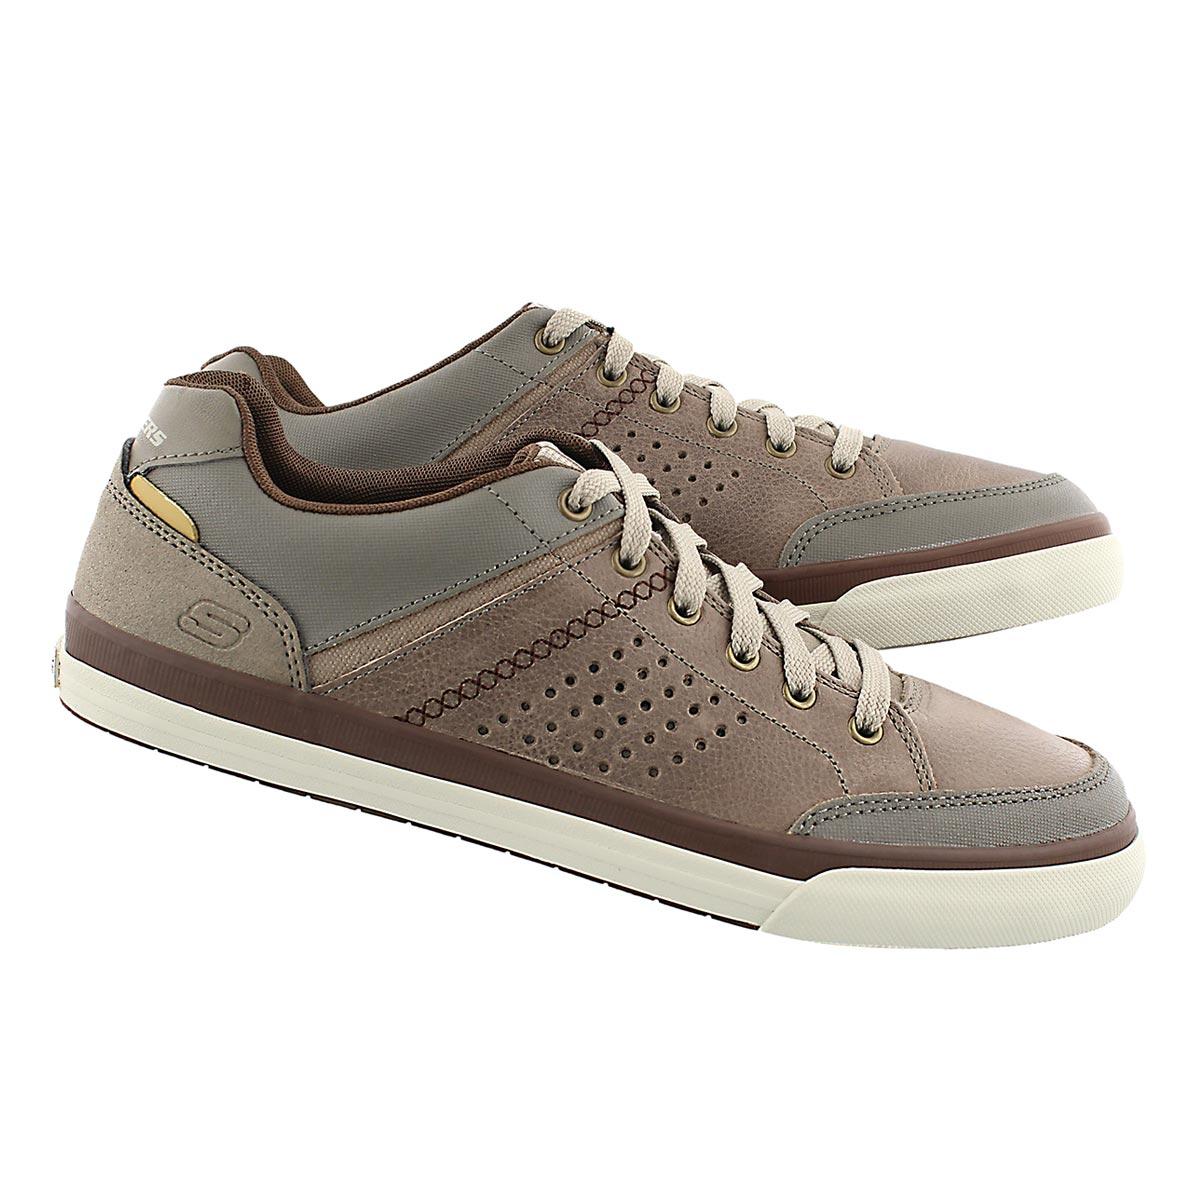 Mns Diamondback Rendol tpe sneaker